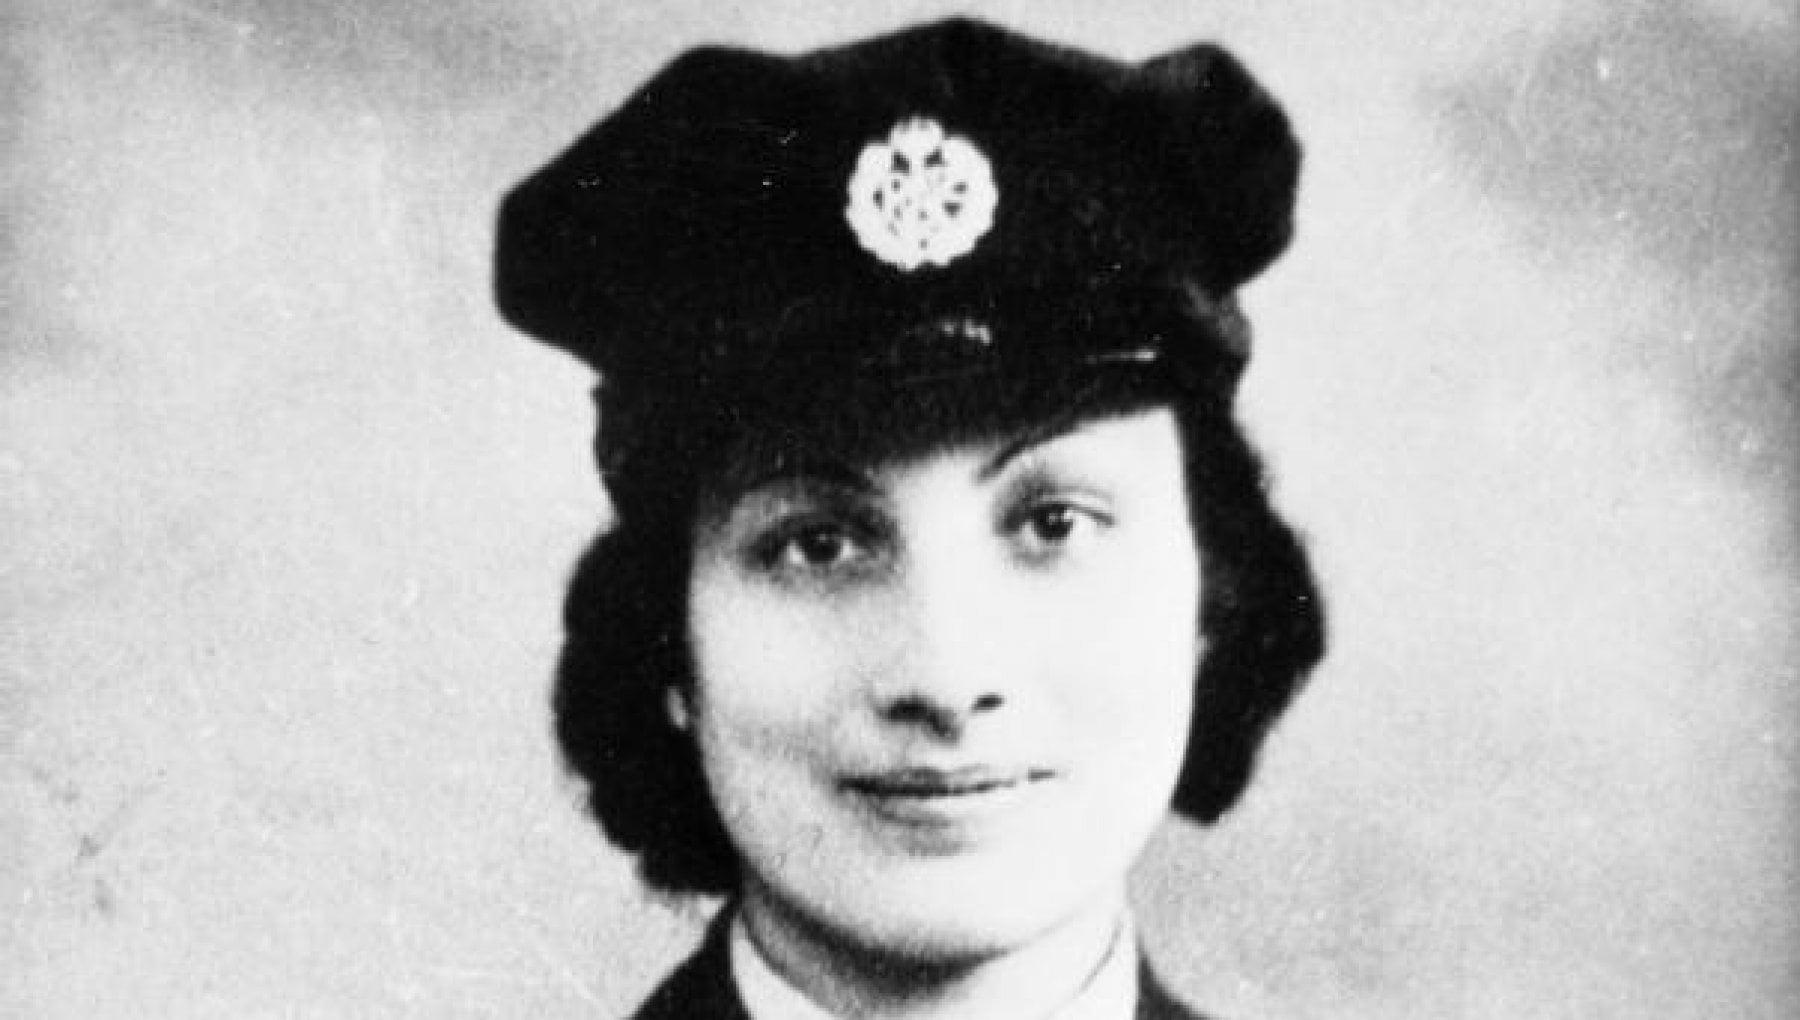 La principessa indiana che spiava i nazisti